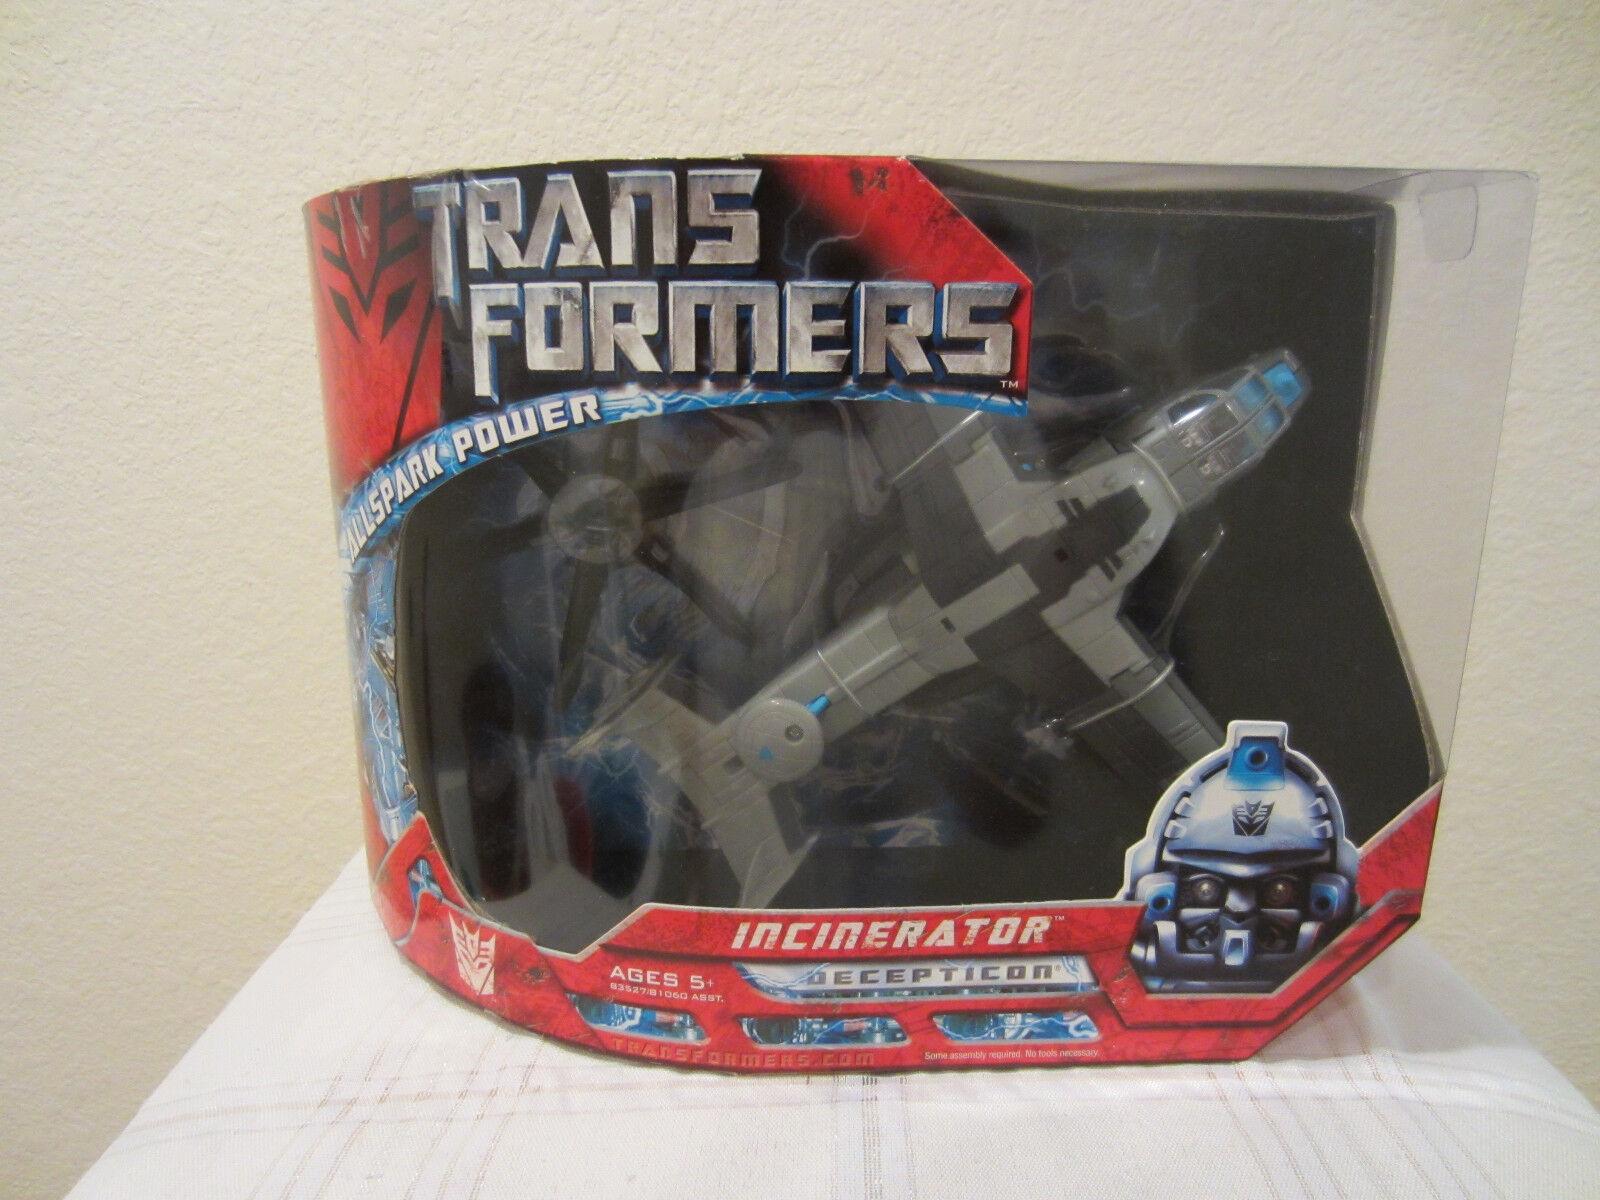 Transformers Hasbro 2007 Movie one Voyager Class Decepticon Incinerator MISB